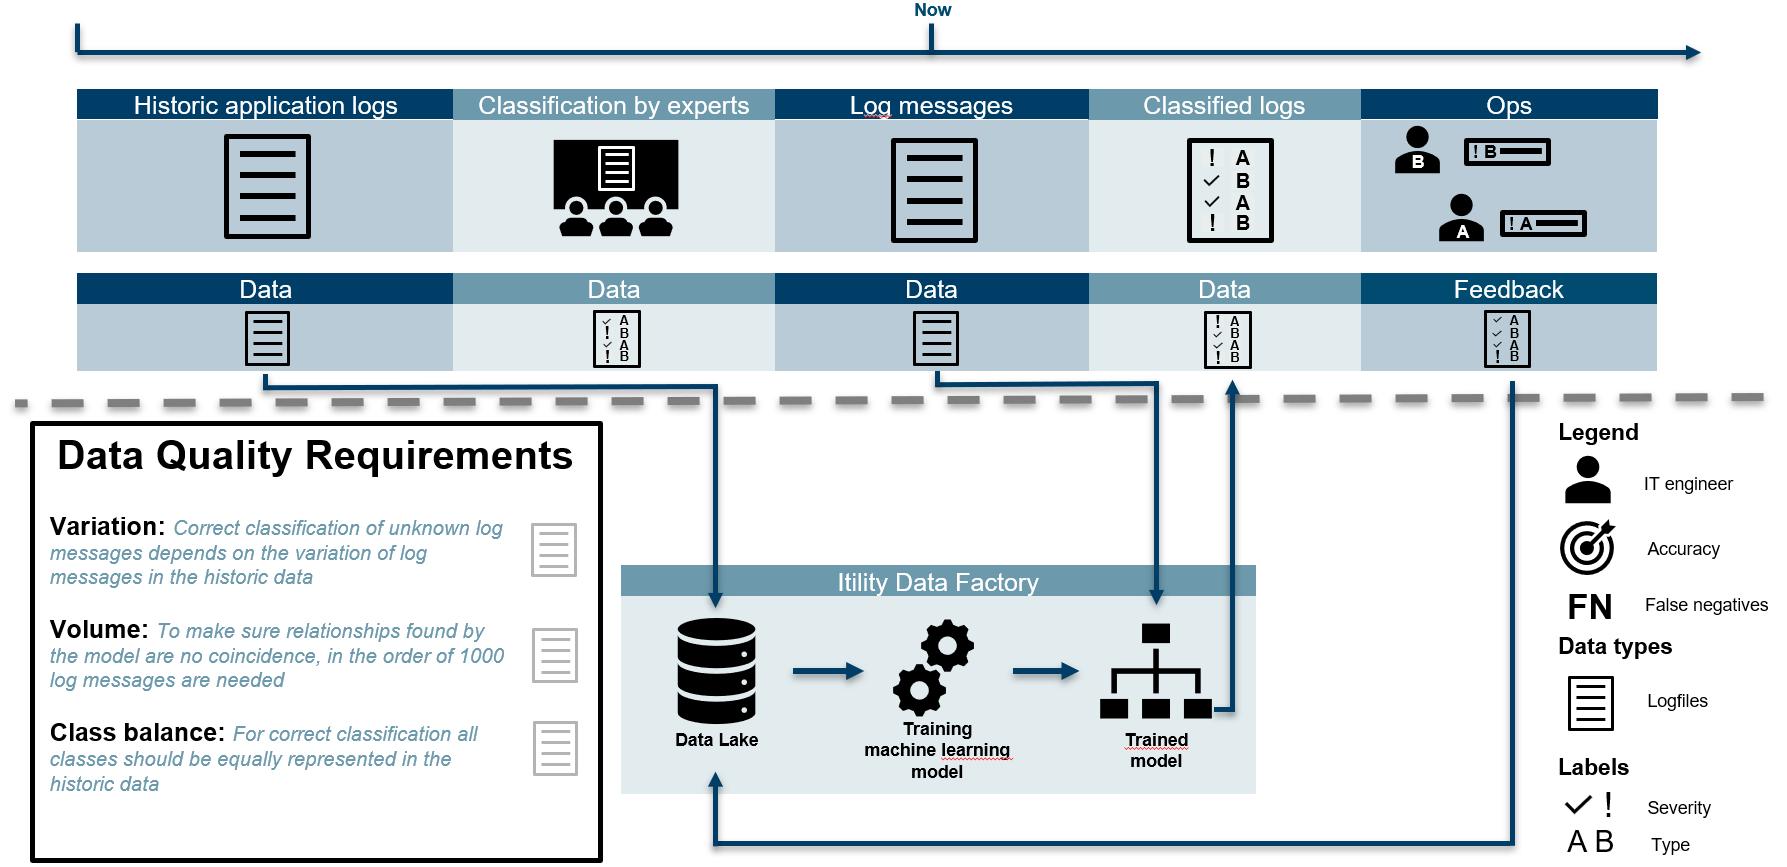 IAA-IT application log classification-1